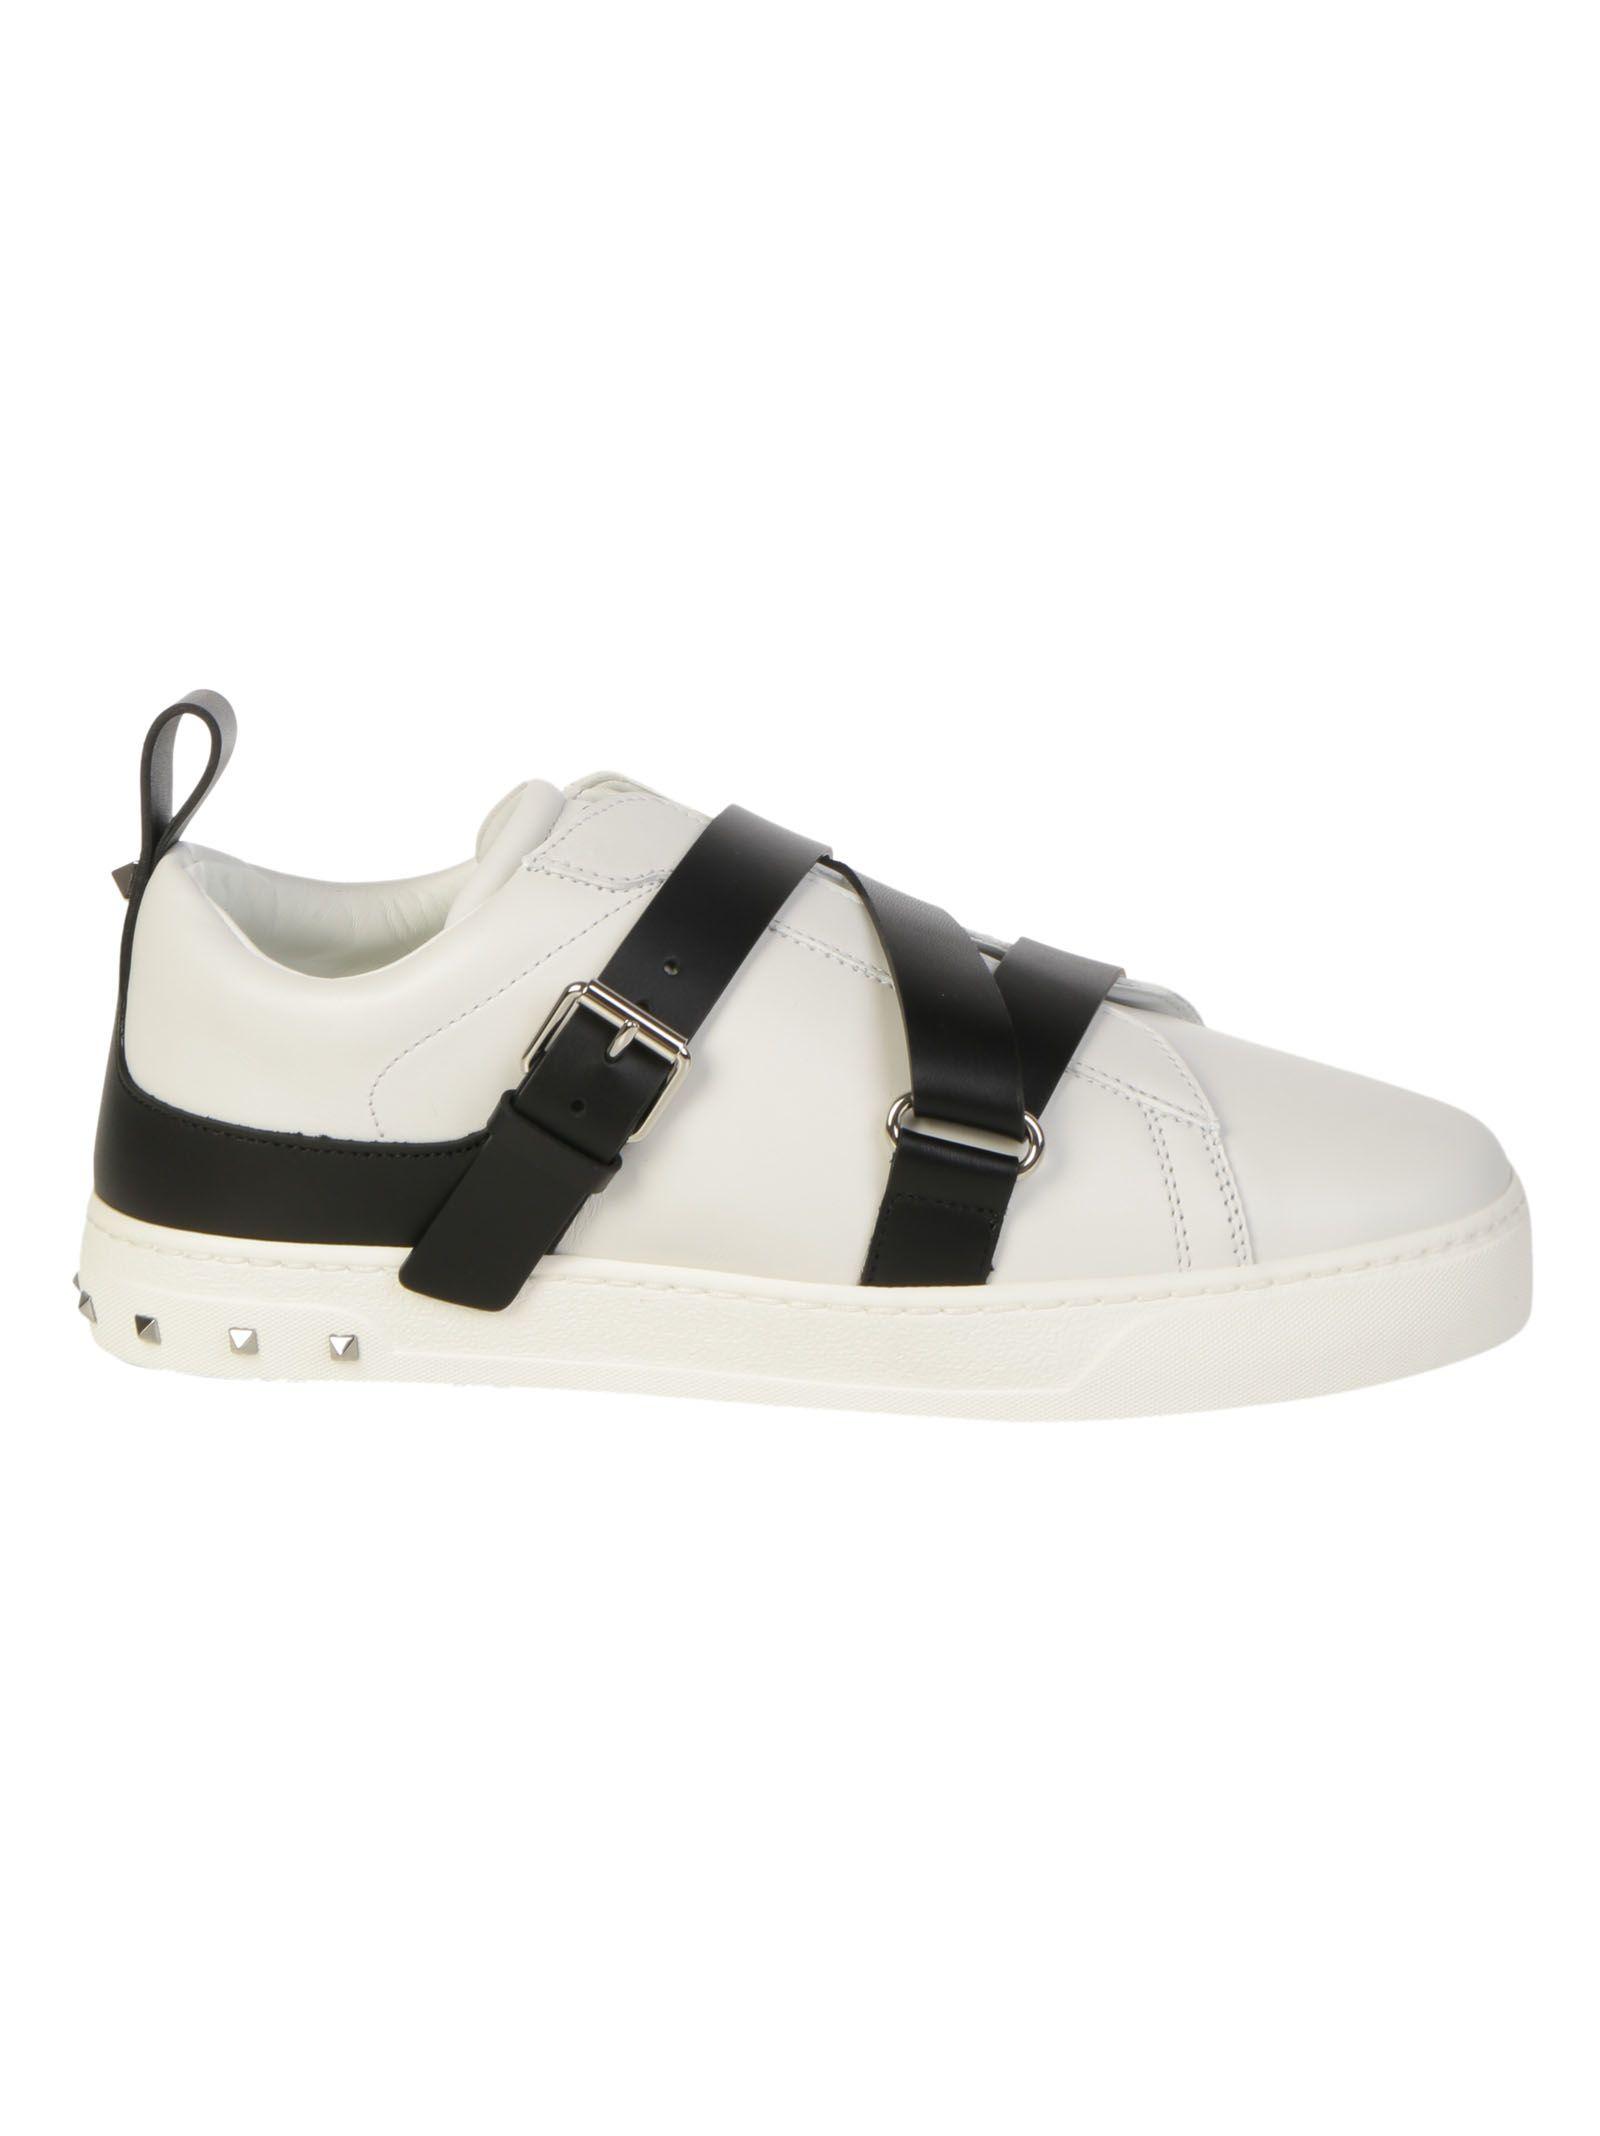 valentino garavani valentino garavani sneakers nero bianco women 39 s sneakers italist. Black Bedroom Furniture Sets. Home Design Ideas